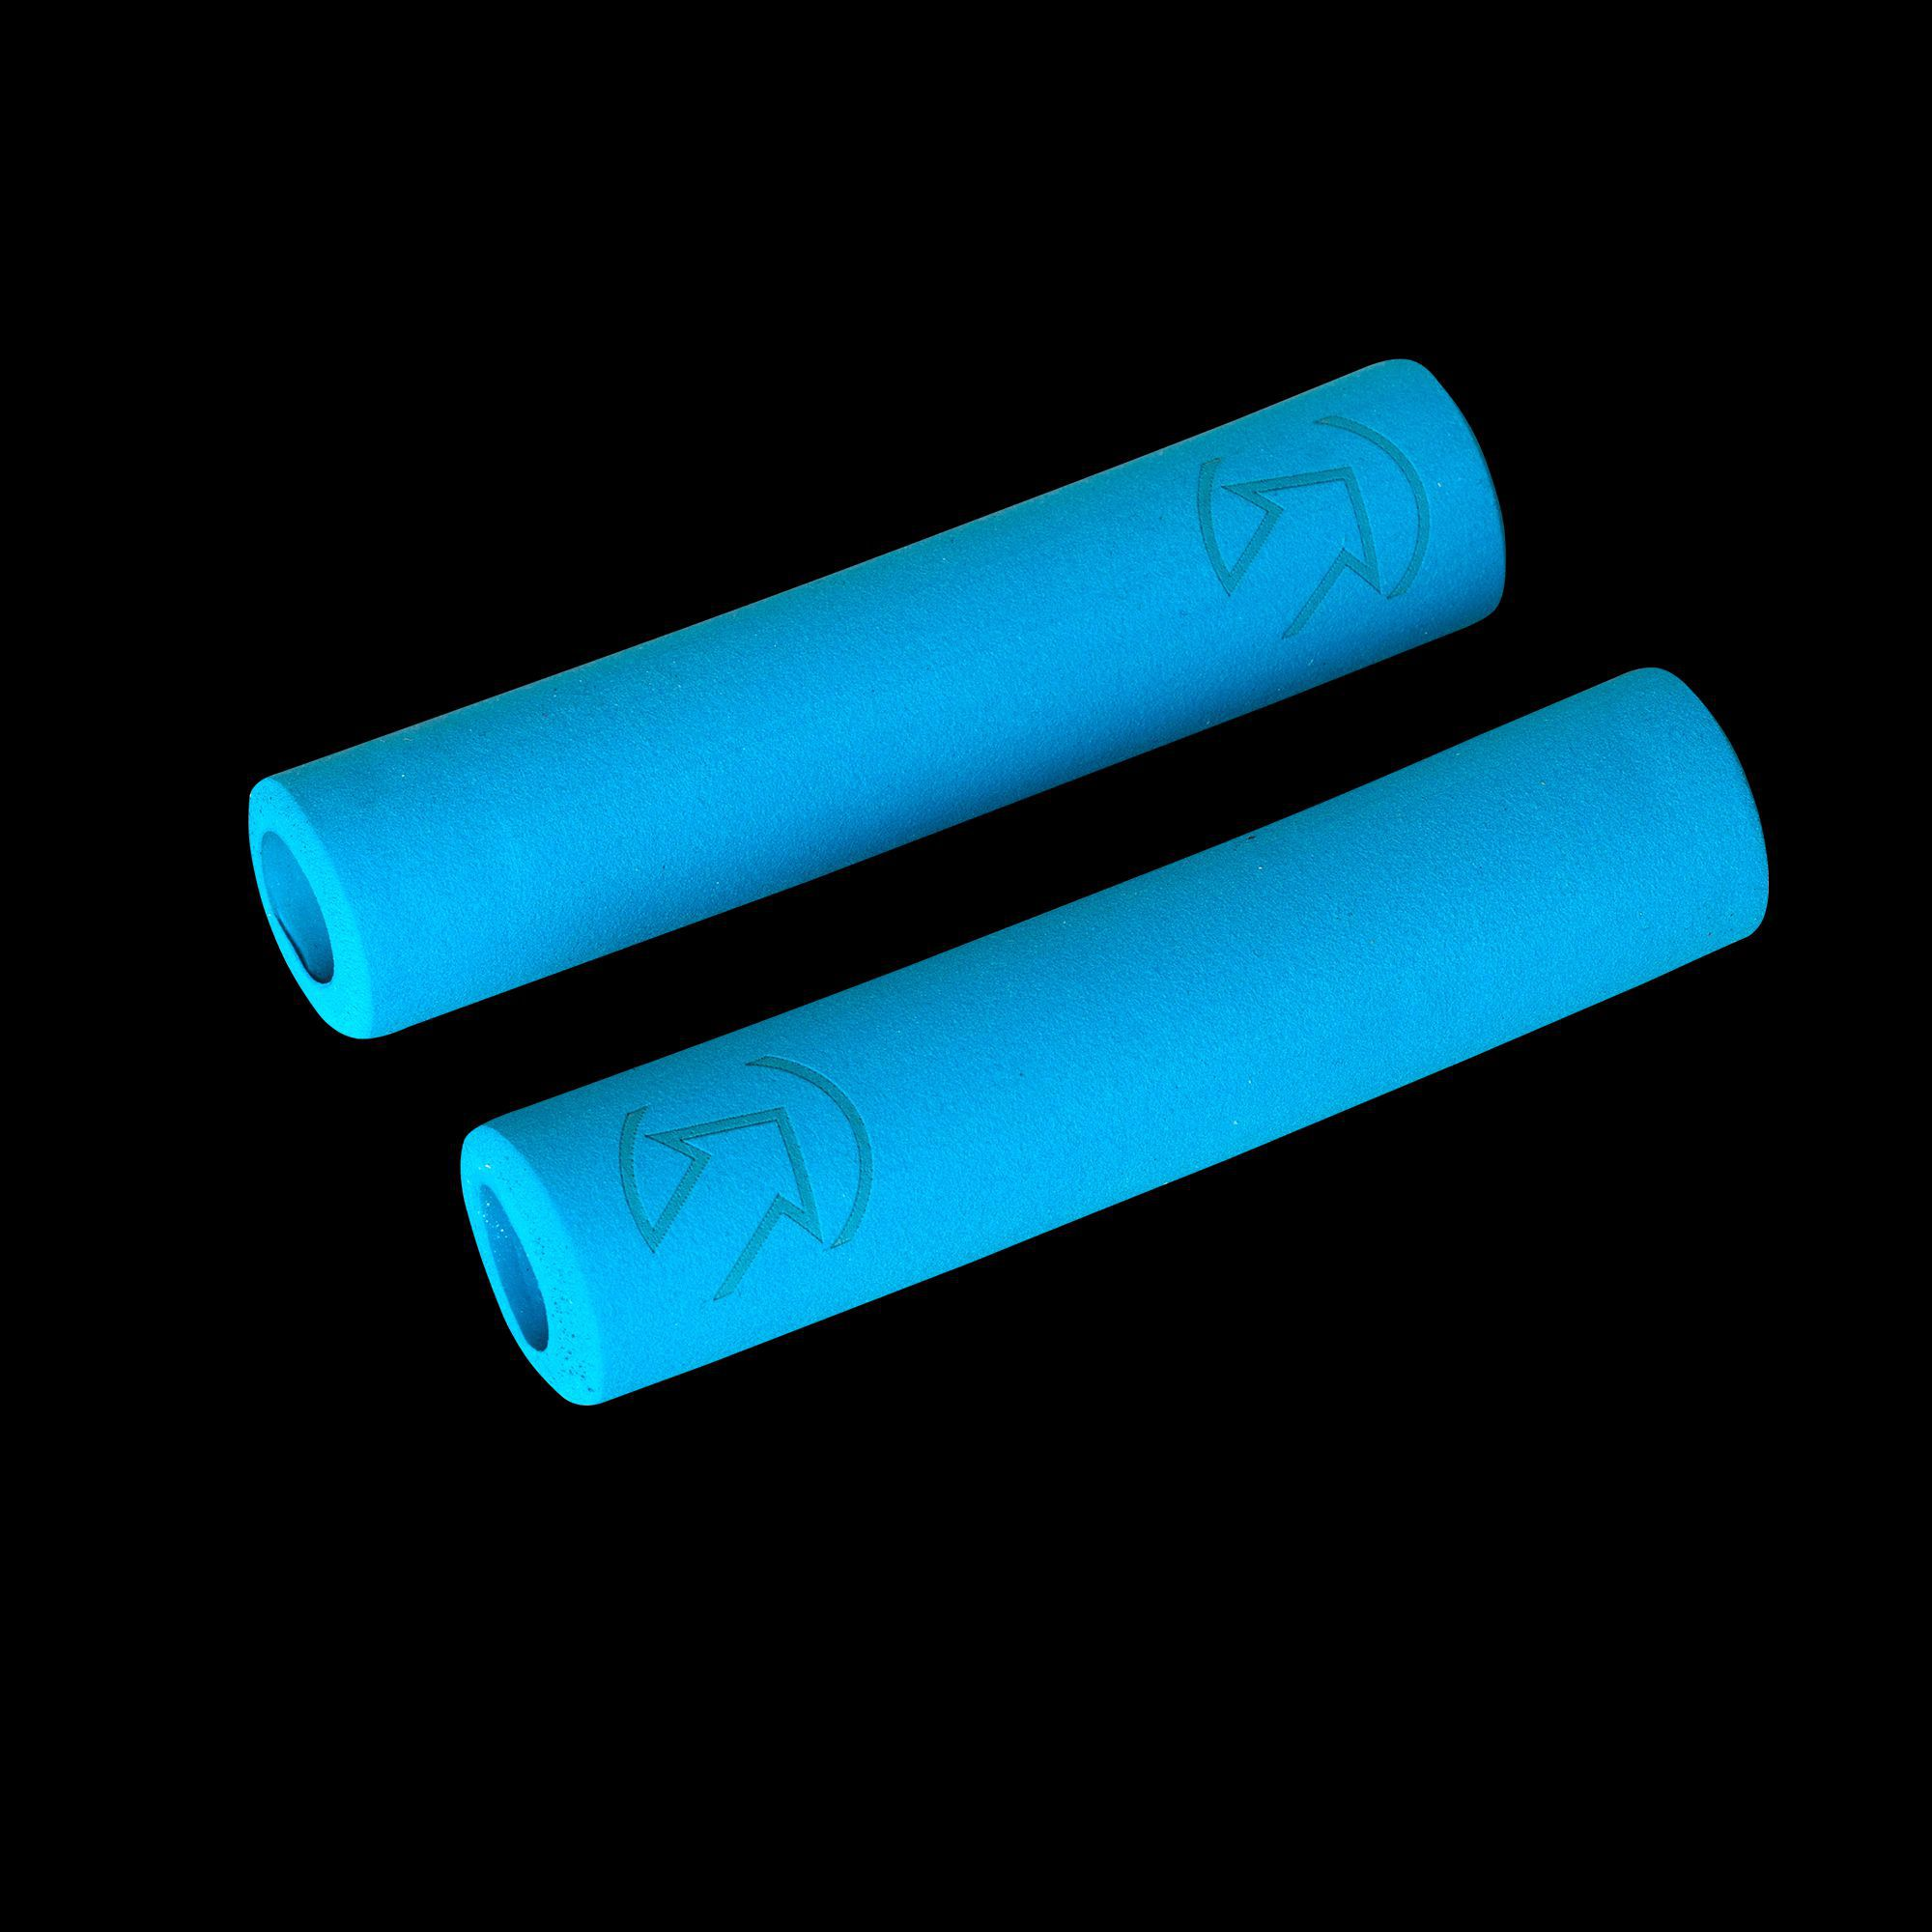 Manopla Shimano Pro Silicone 130mm X 32mm (azul, Vermelha)